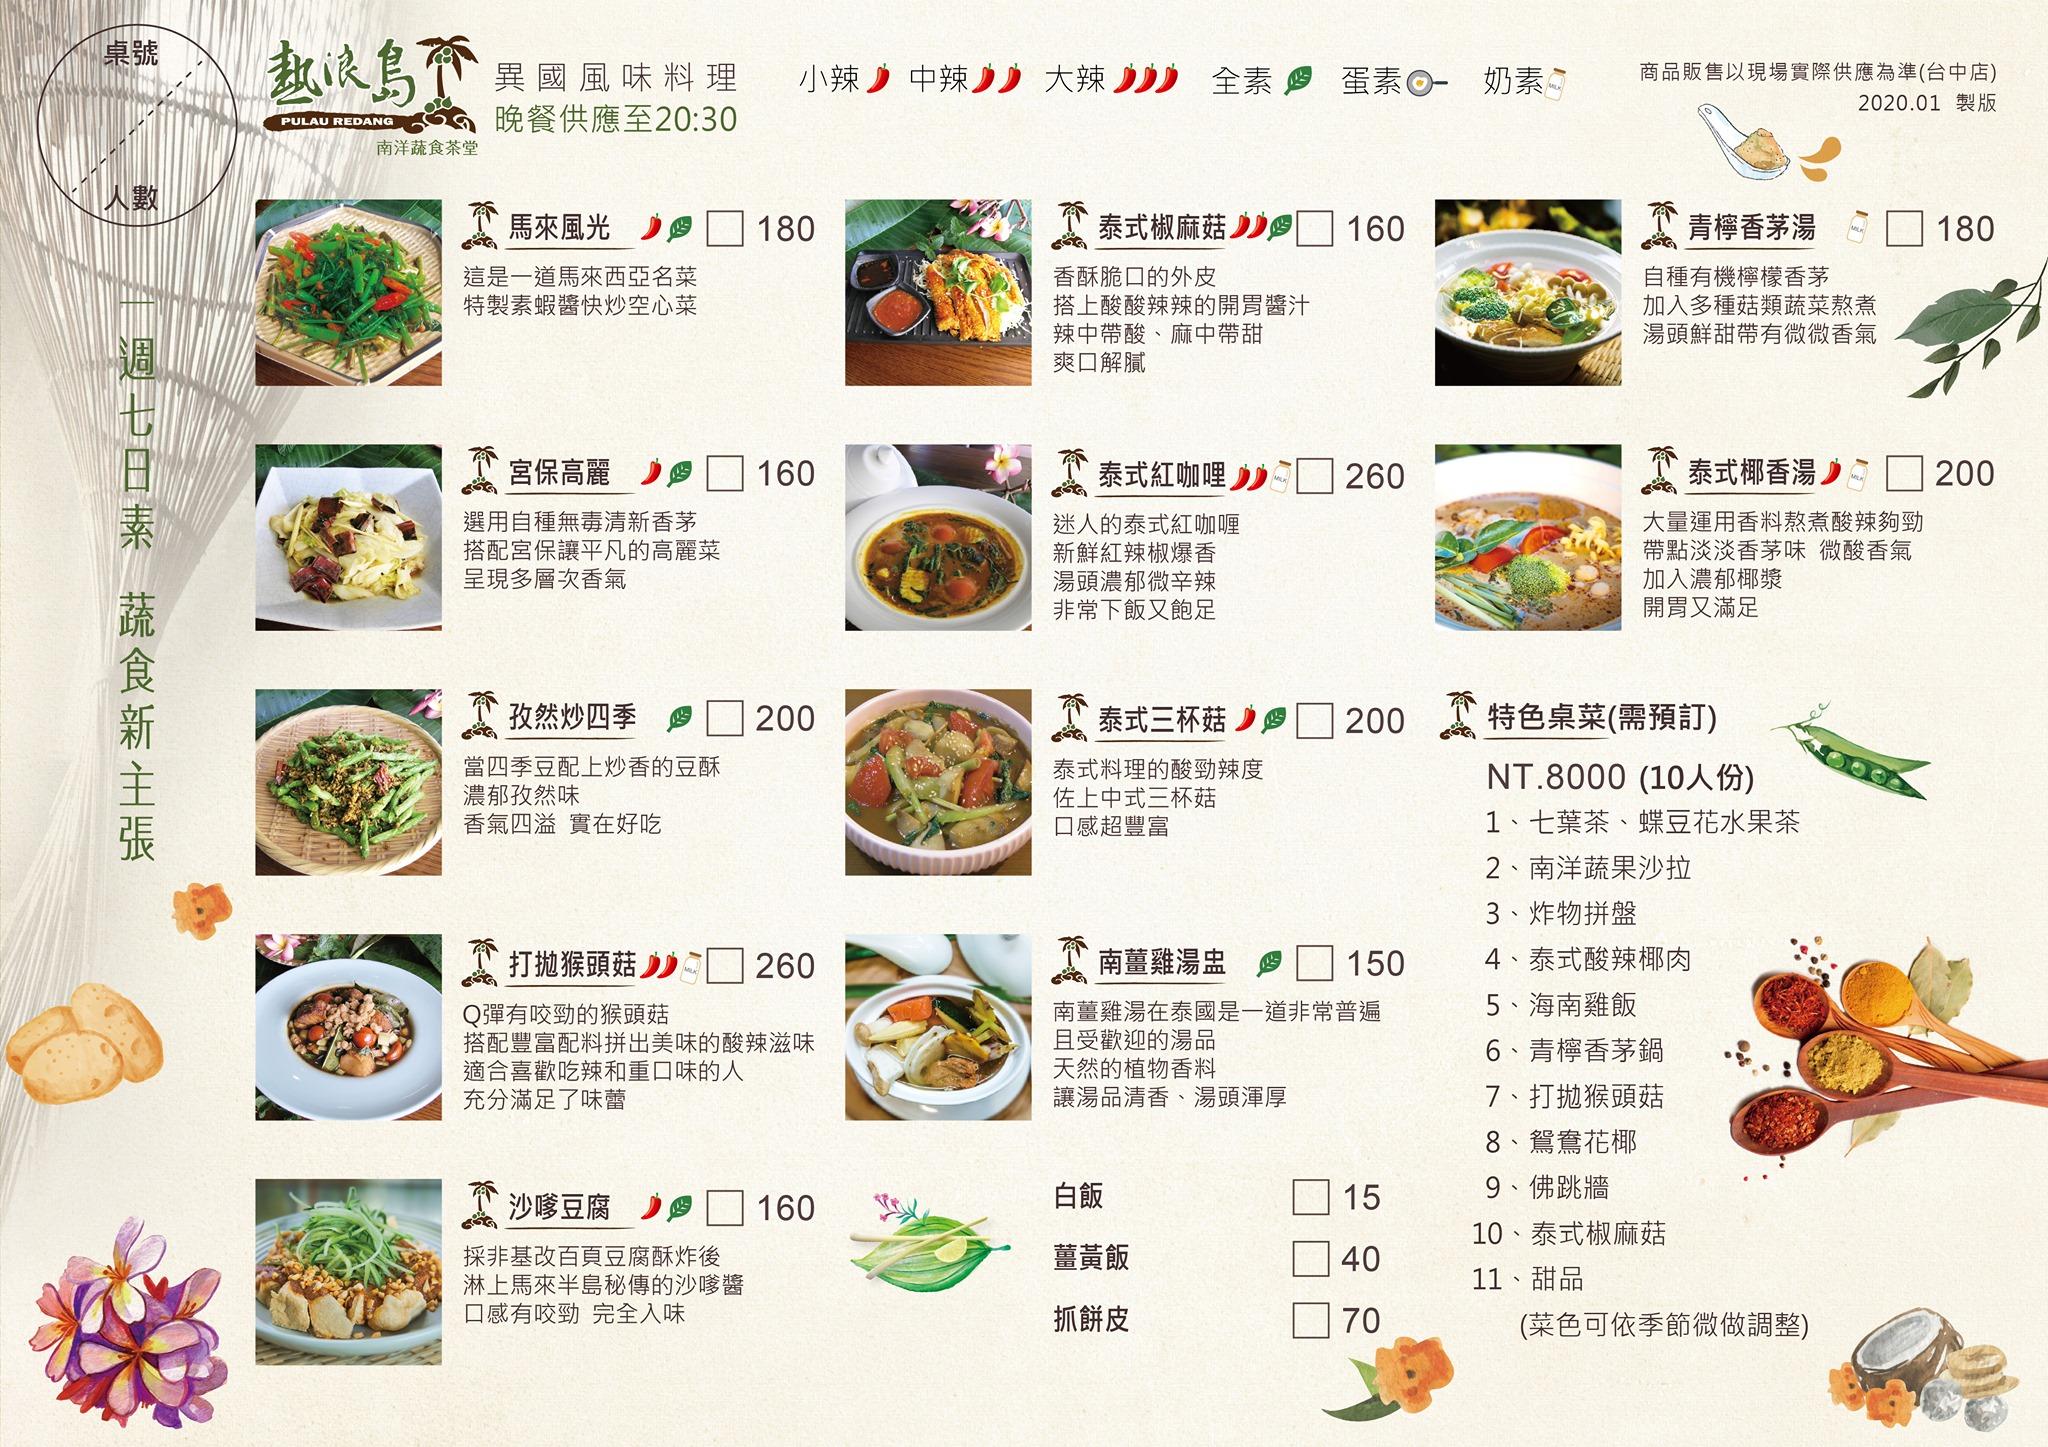 熱浪島菜單